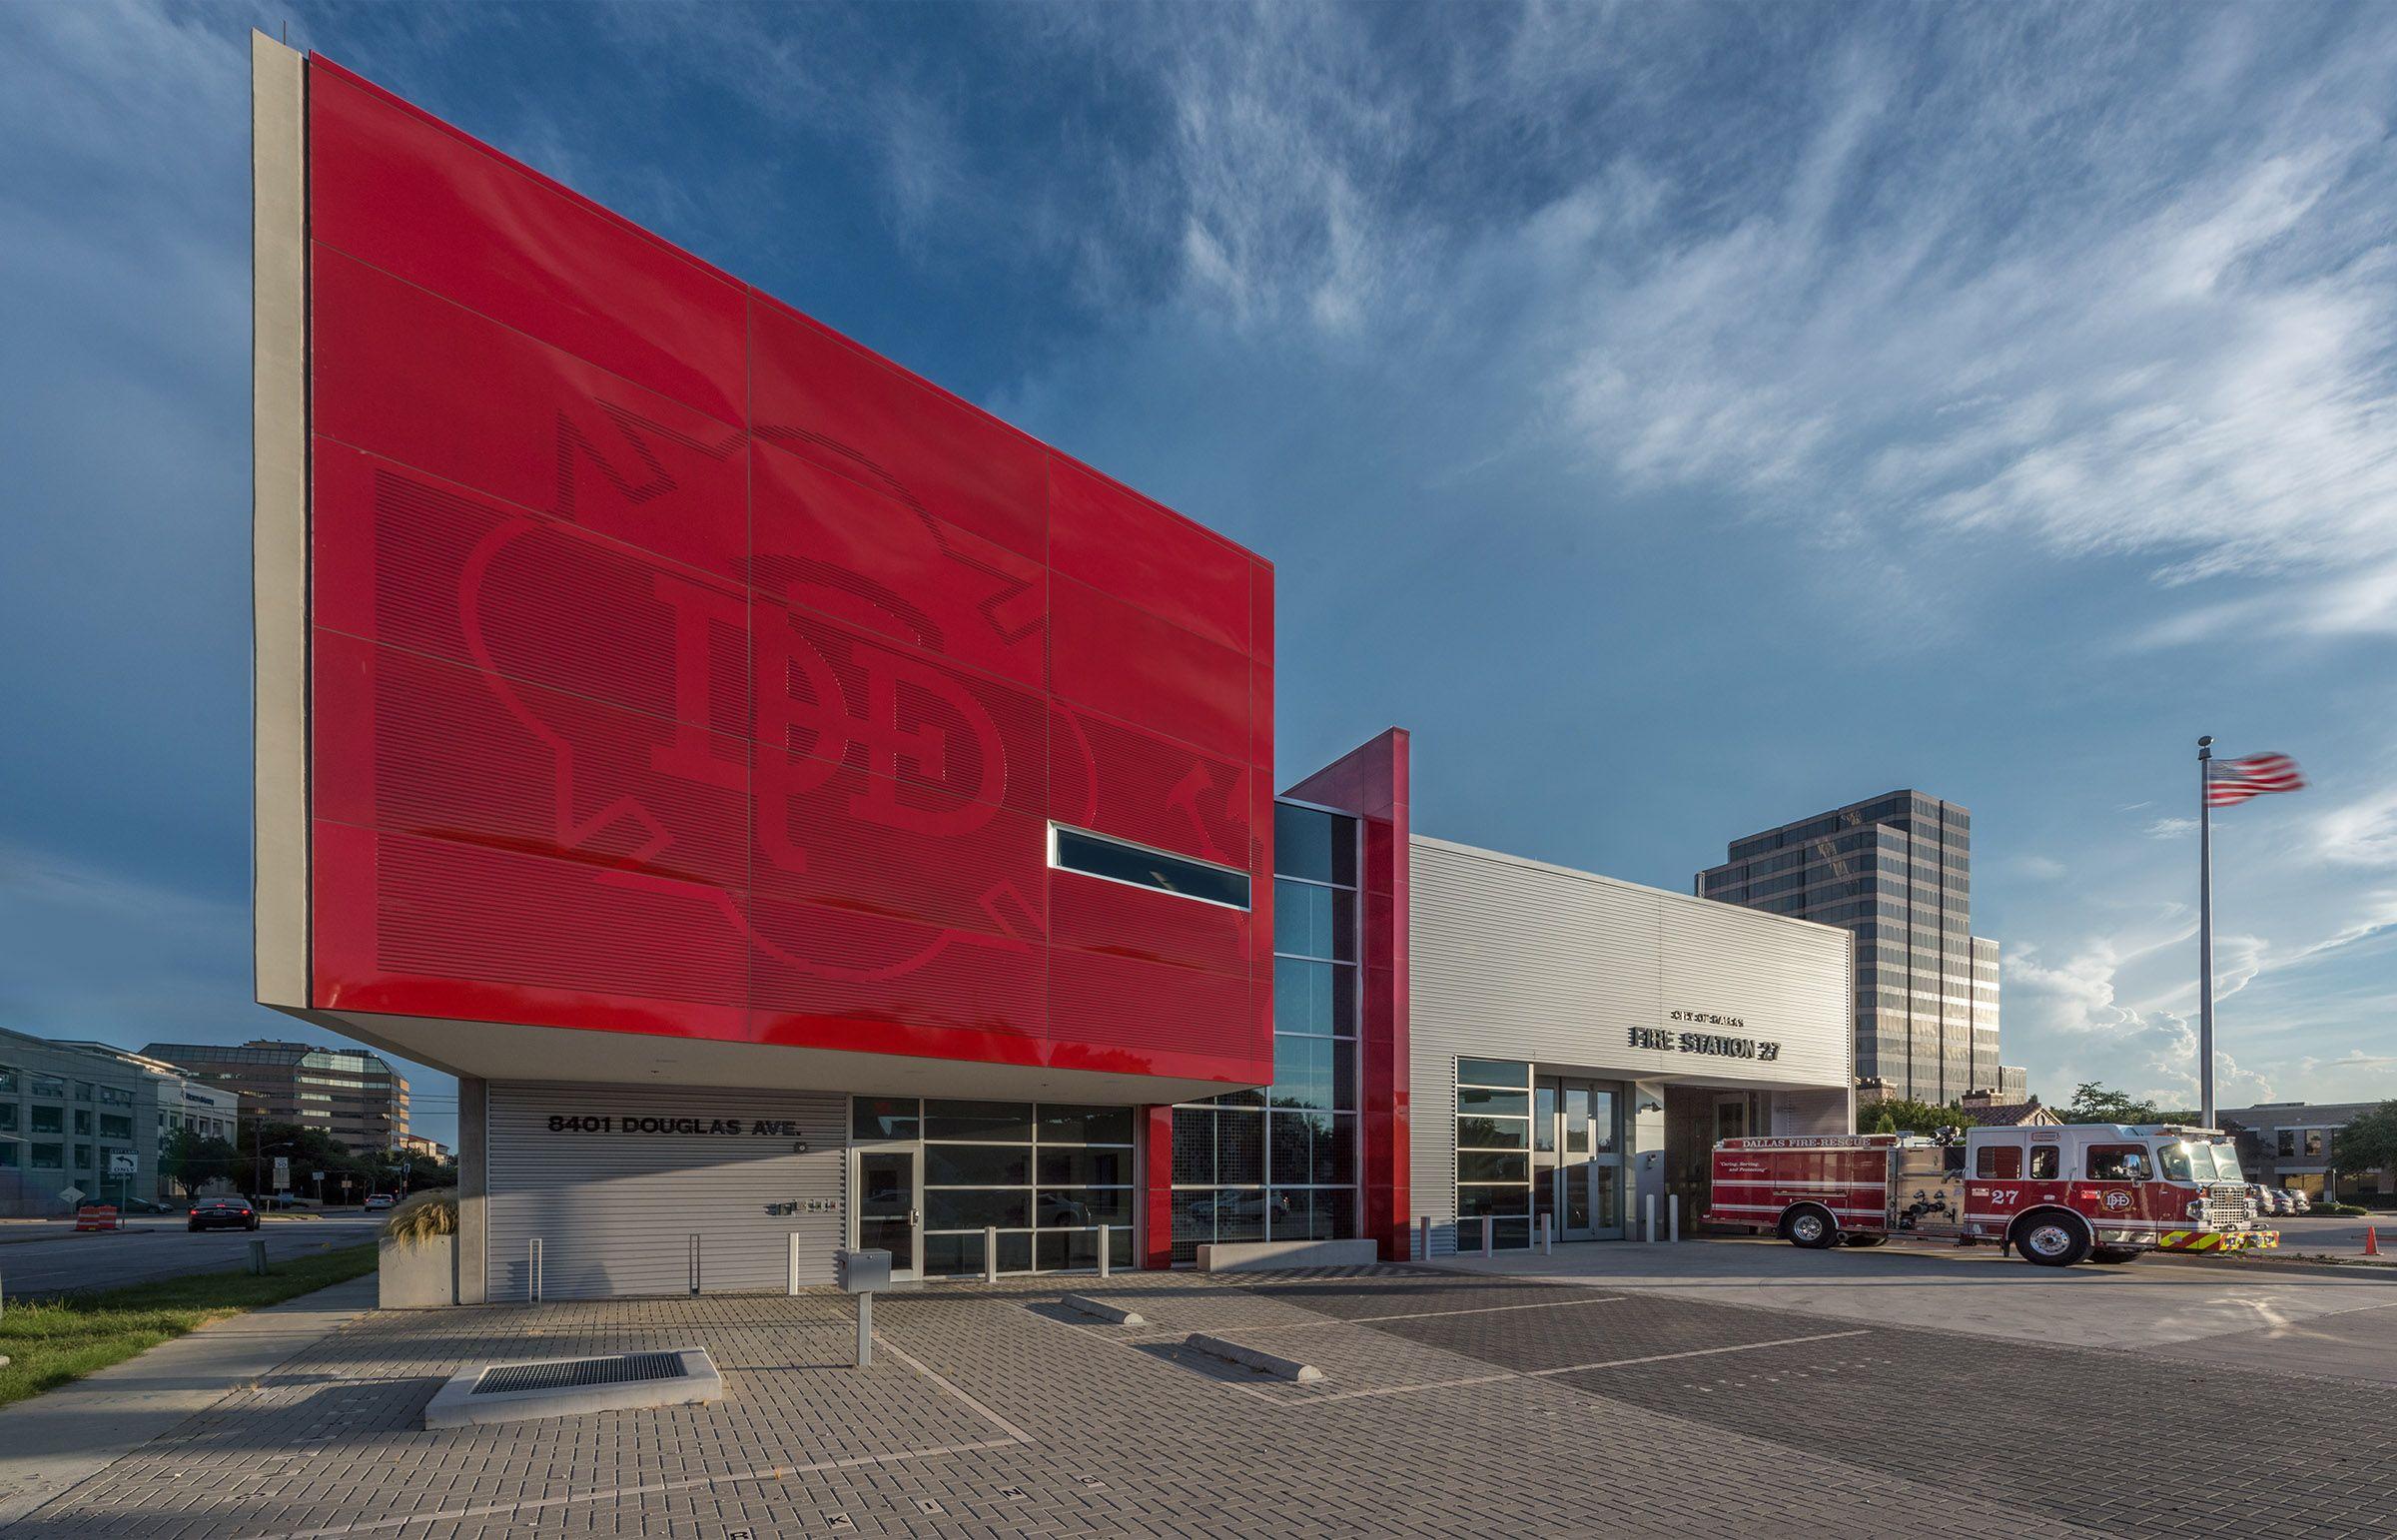 Dallas fire station 27 perkins will firehouses architecture color fire concrete